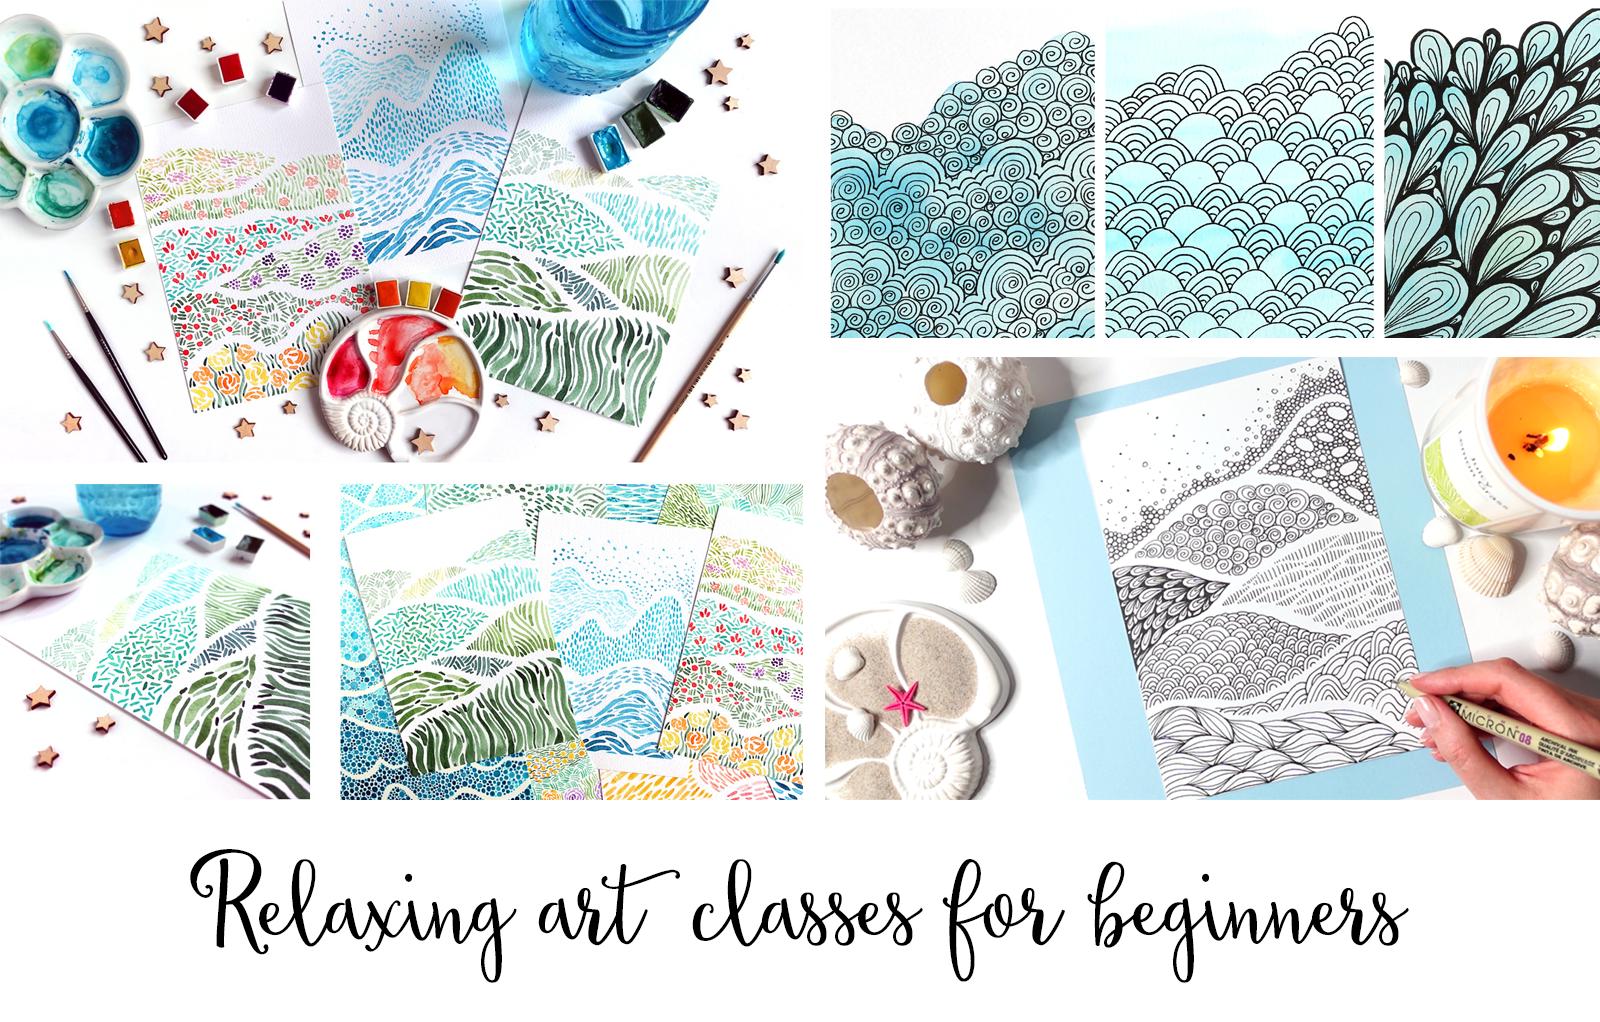 Relaxing art classes for beginners